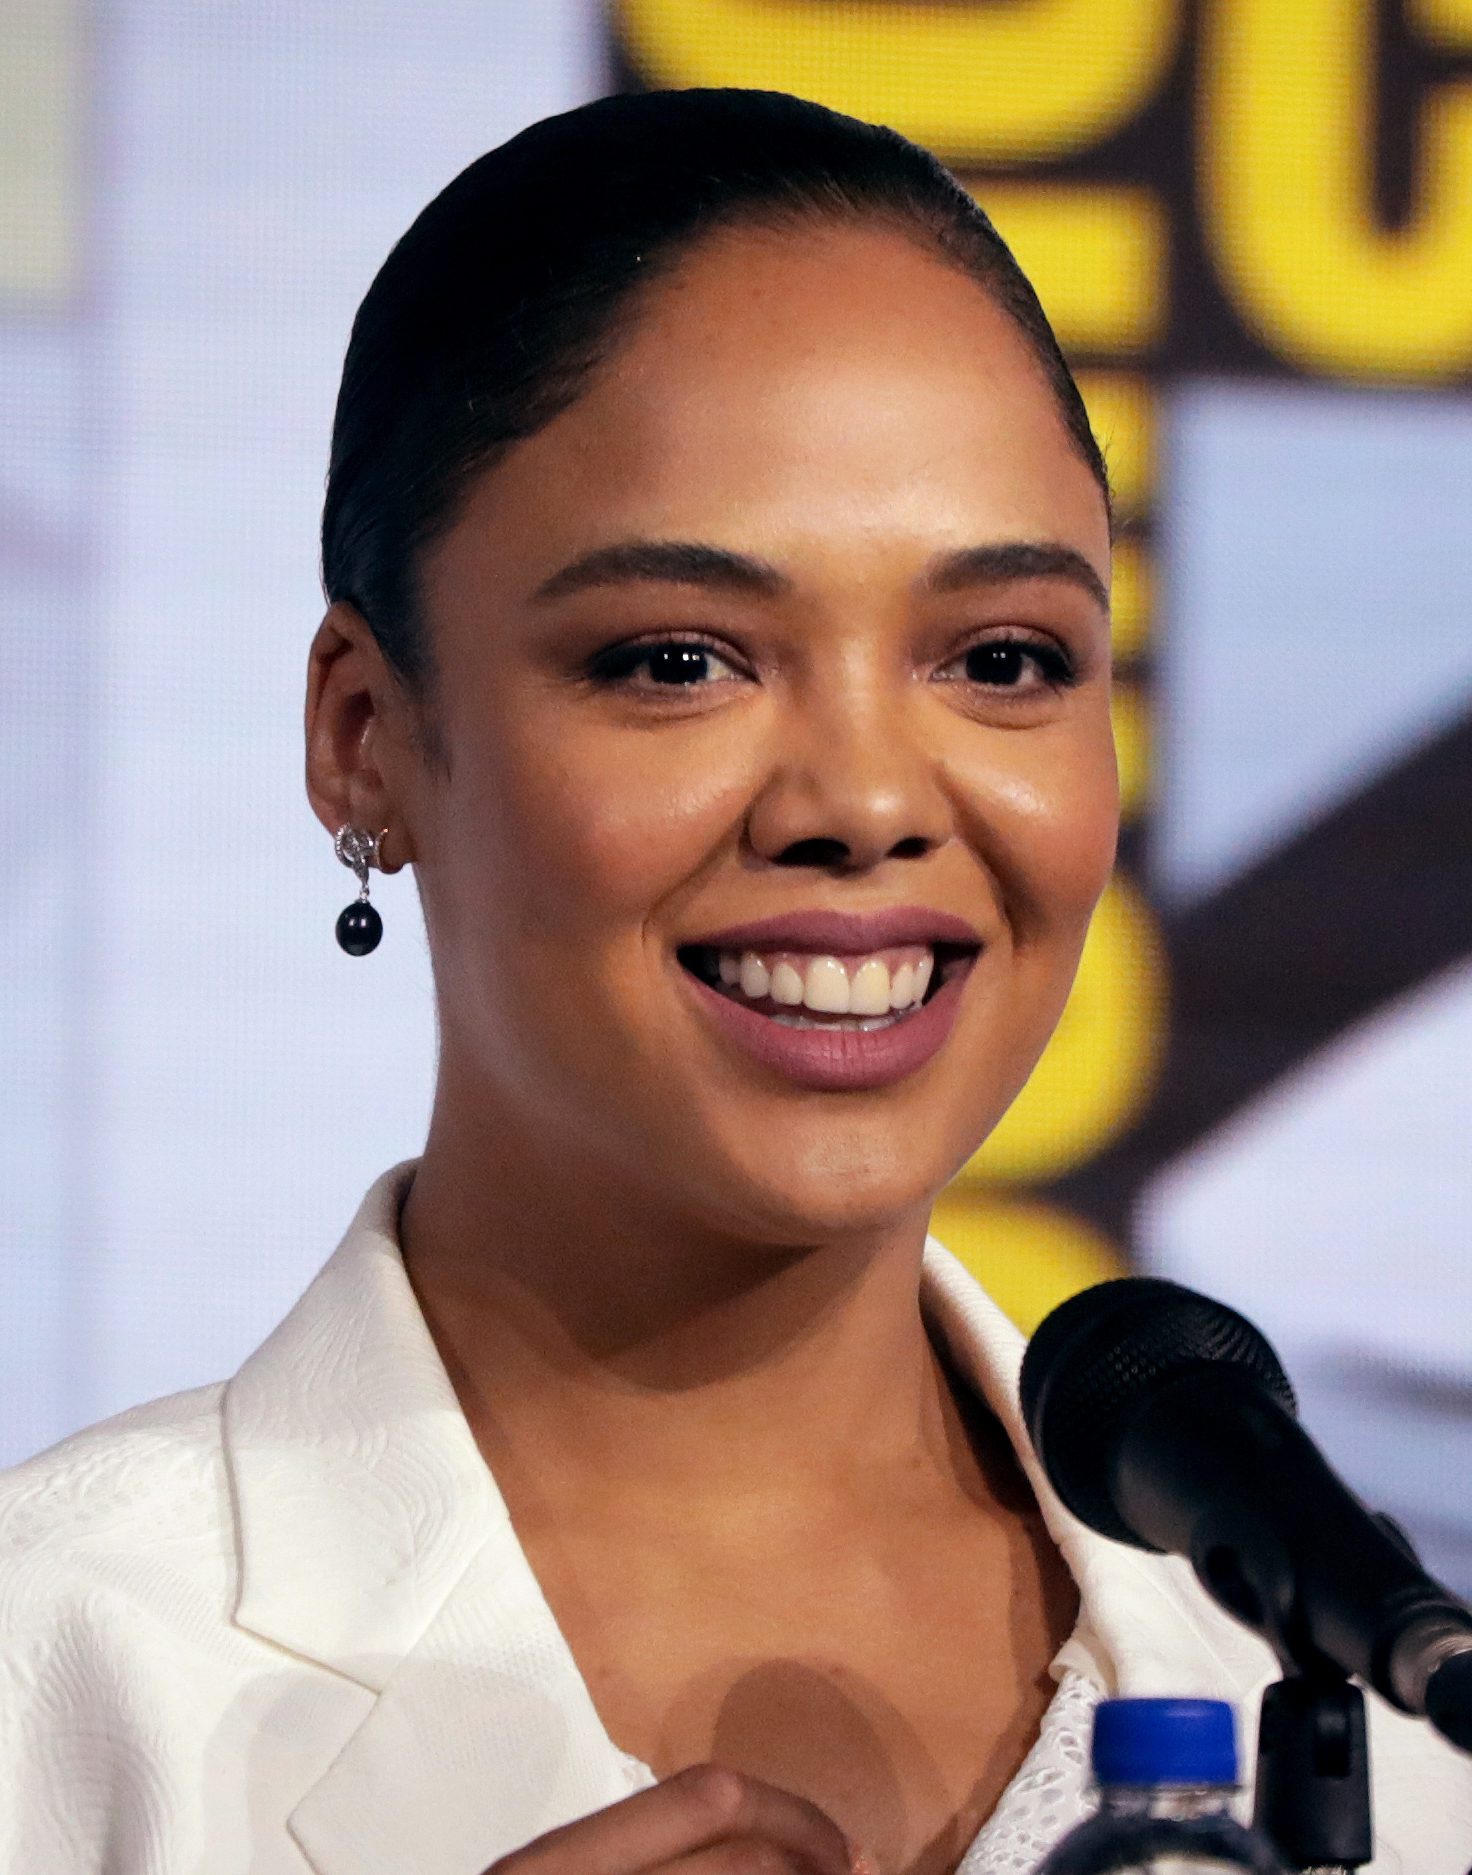 Tessa Thompson - Wikipedia